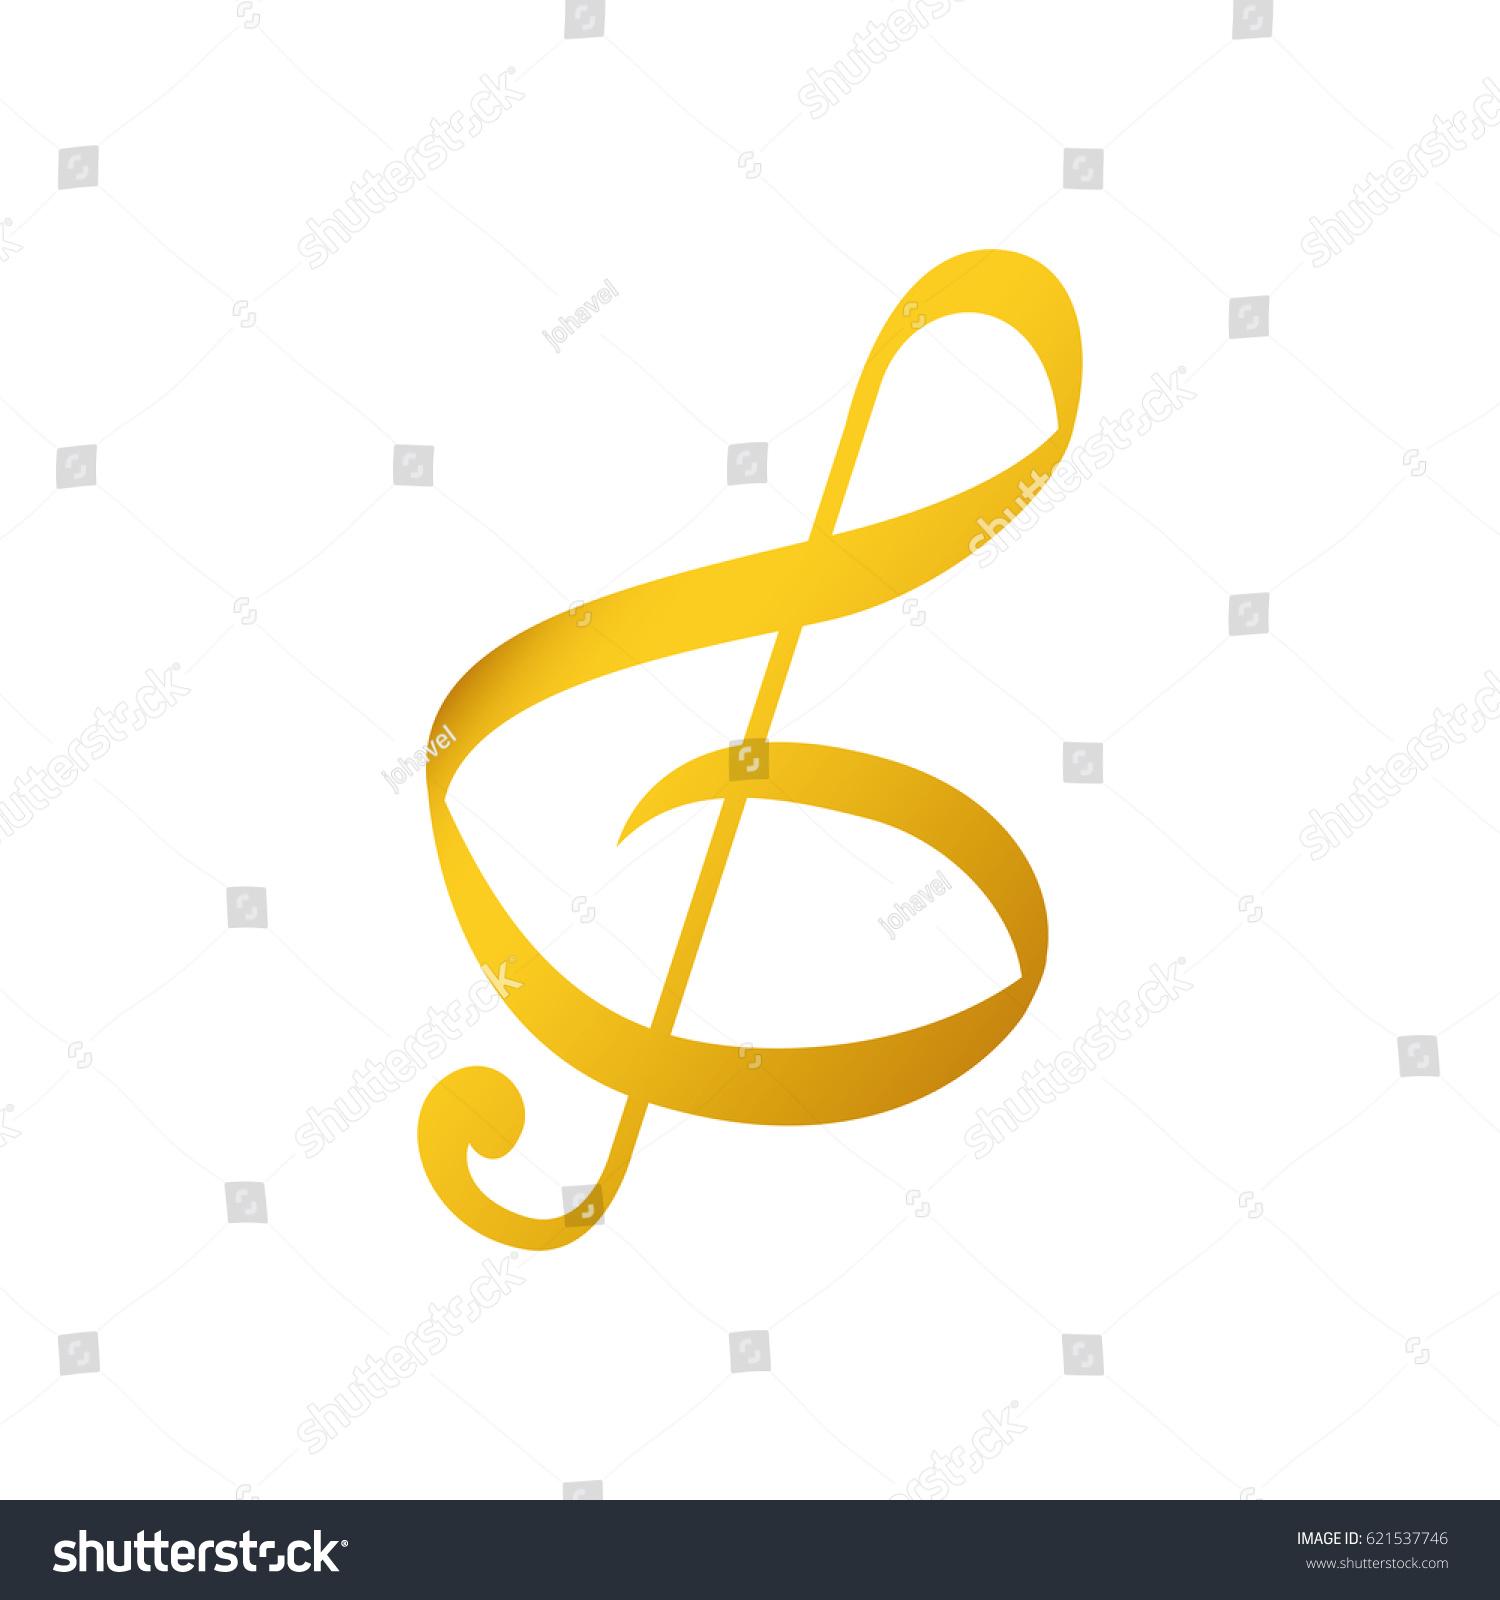 Music Note Symbol Ez Canvas